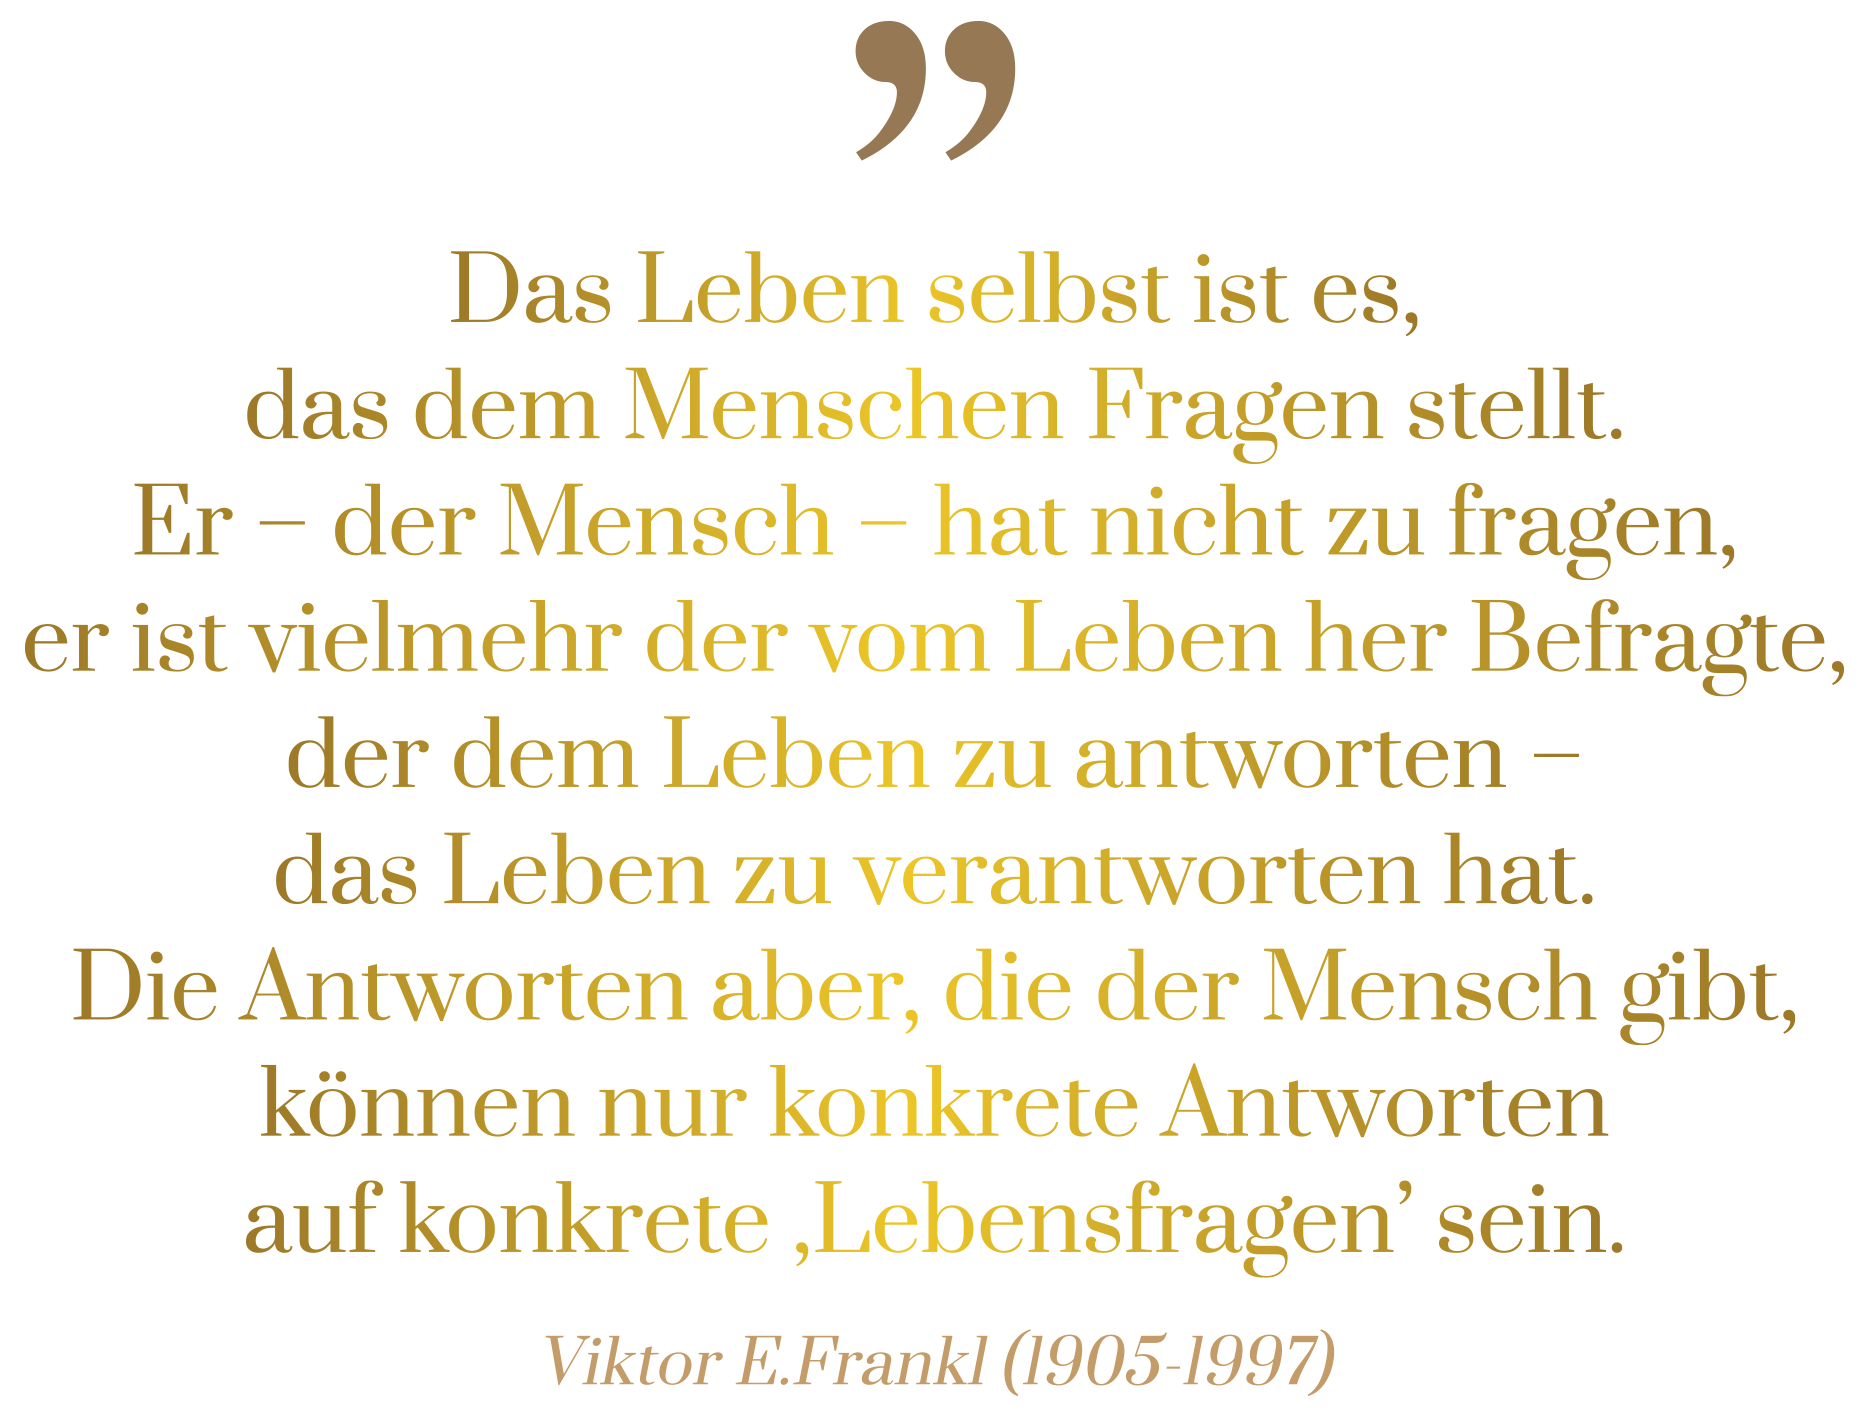 Birgit Baumann - Psychologische Beratung